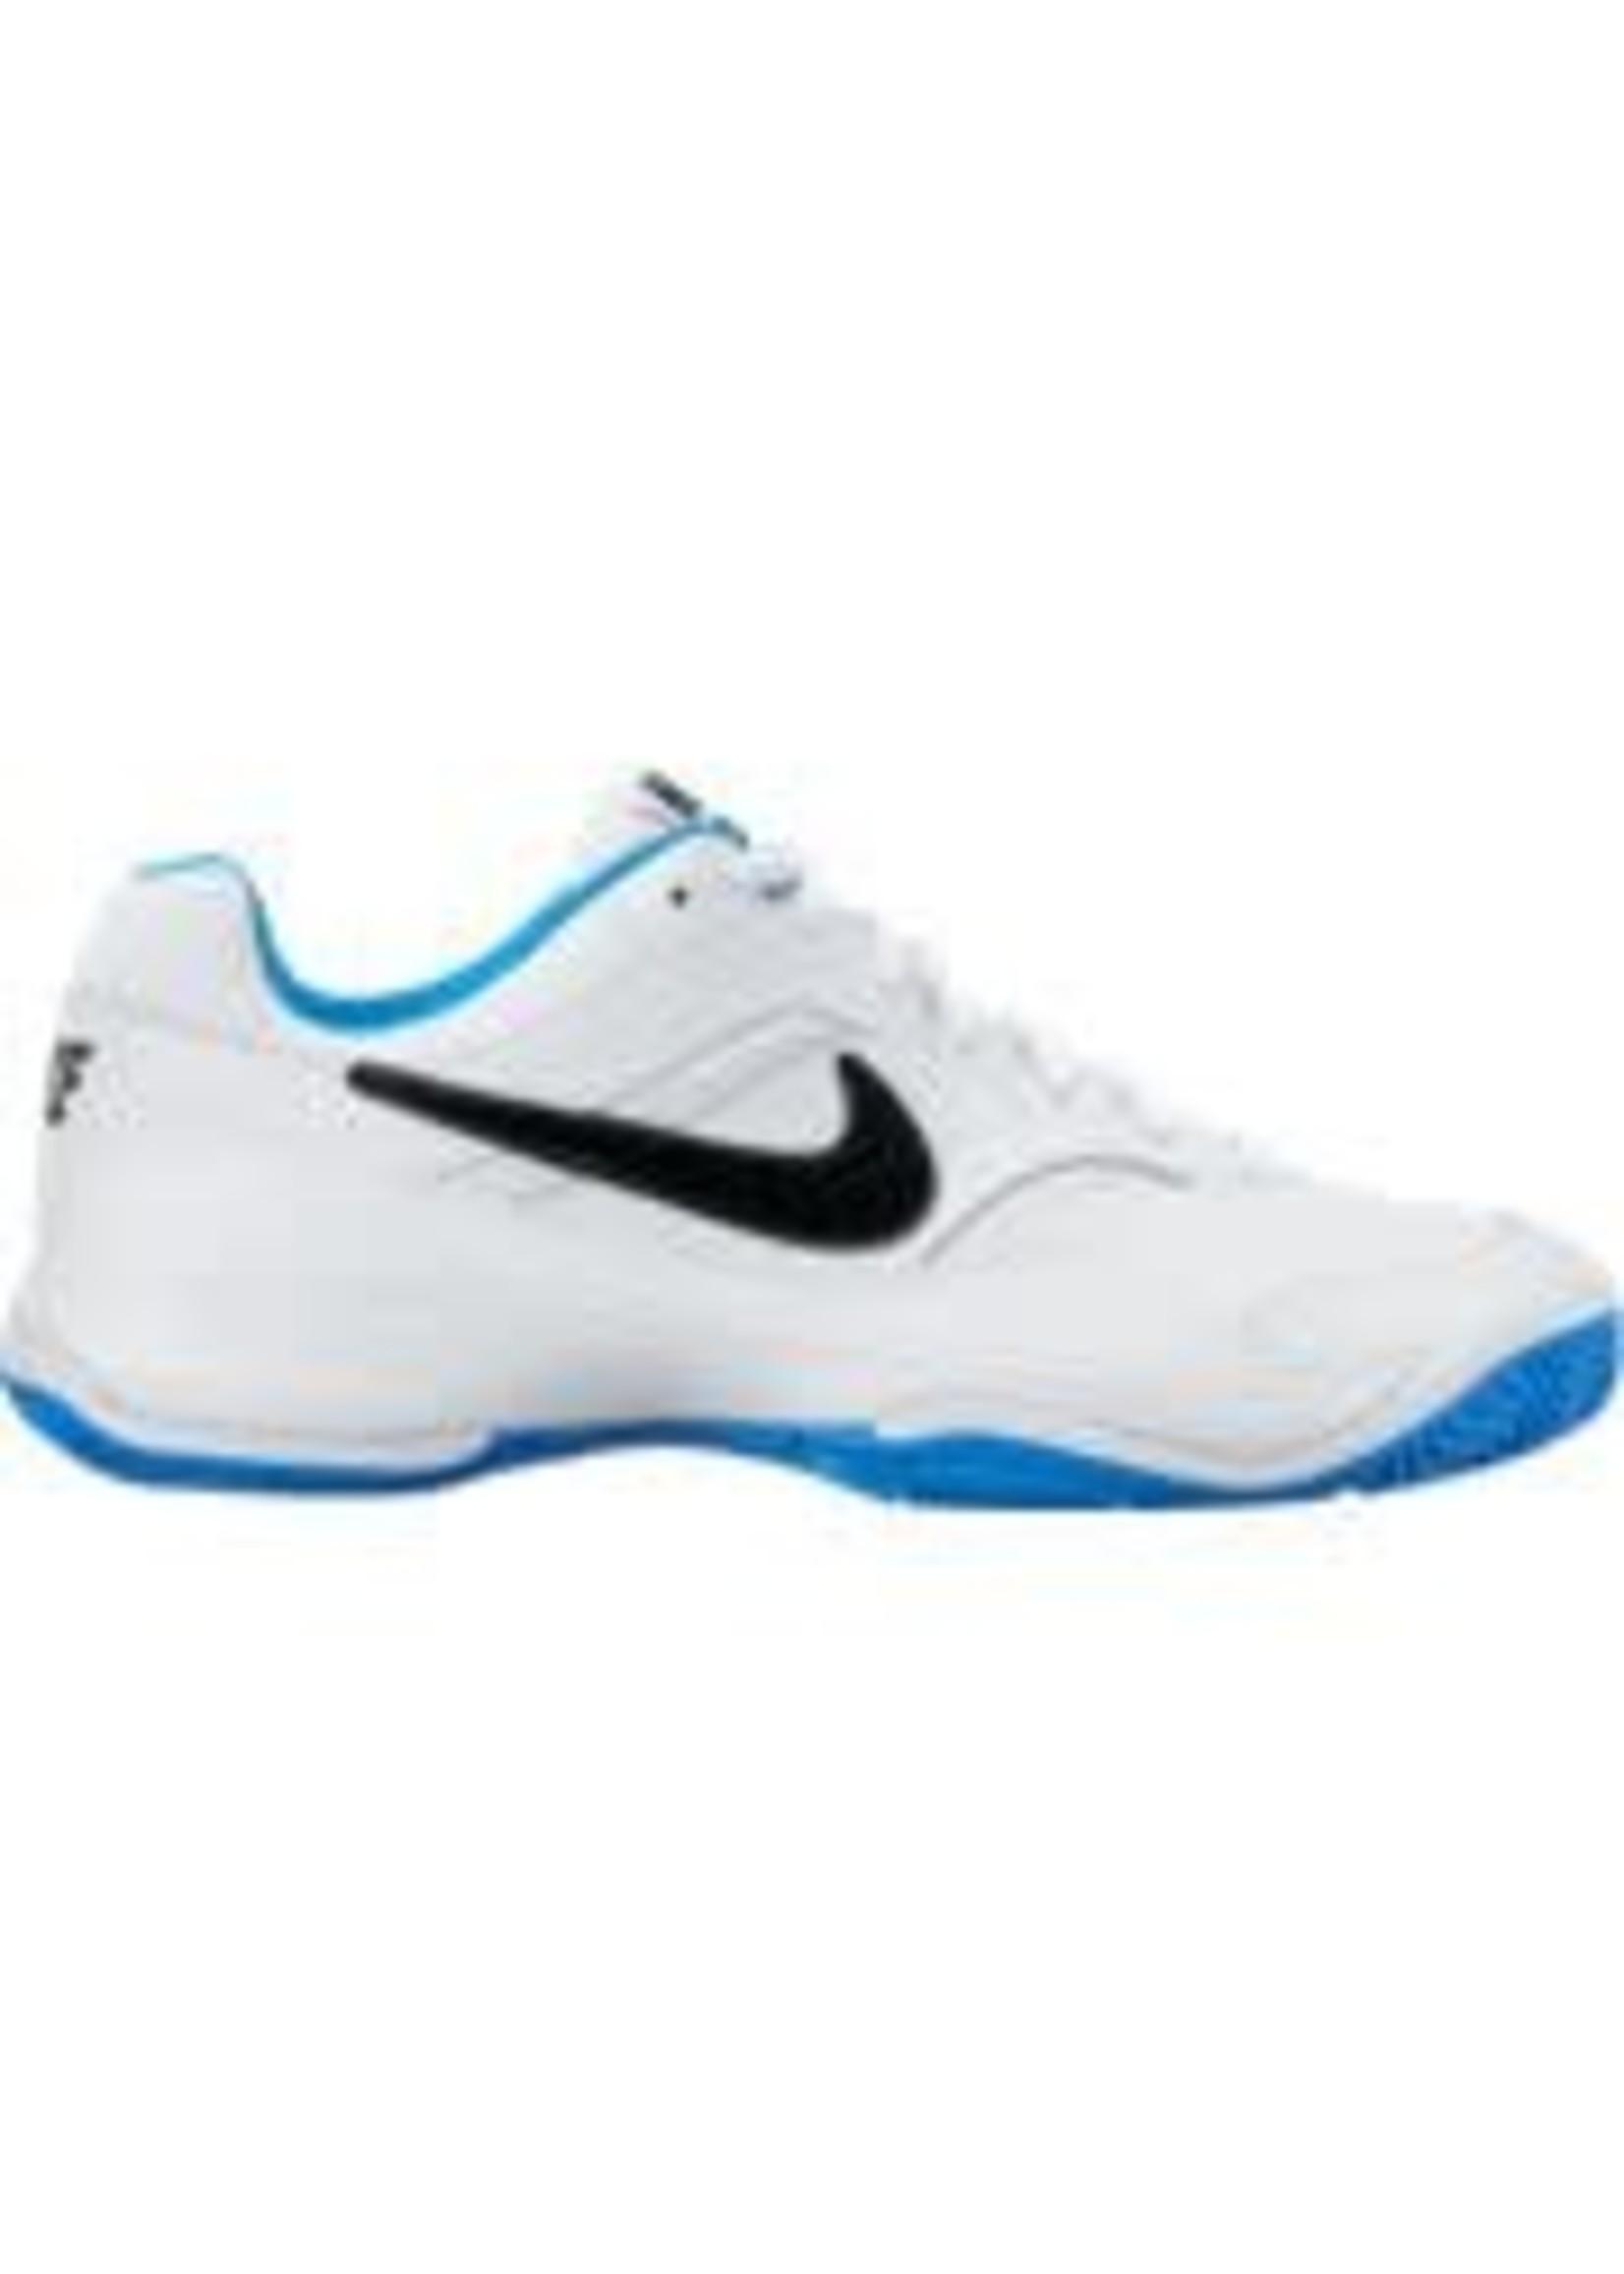 Nike Mens Court Lite Tennis Shoe White/Black/Blue 12